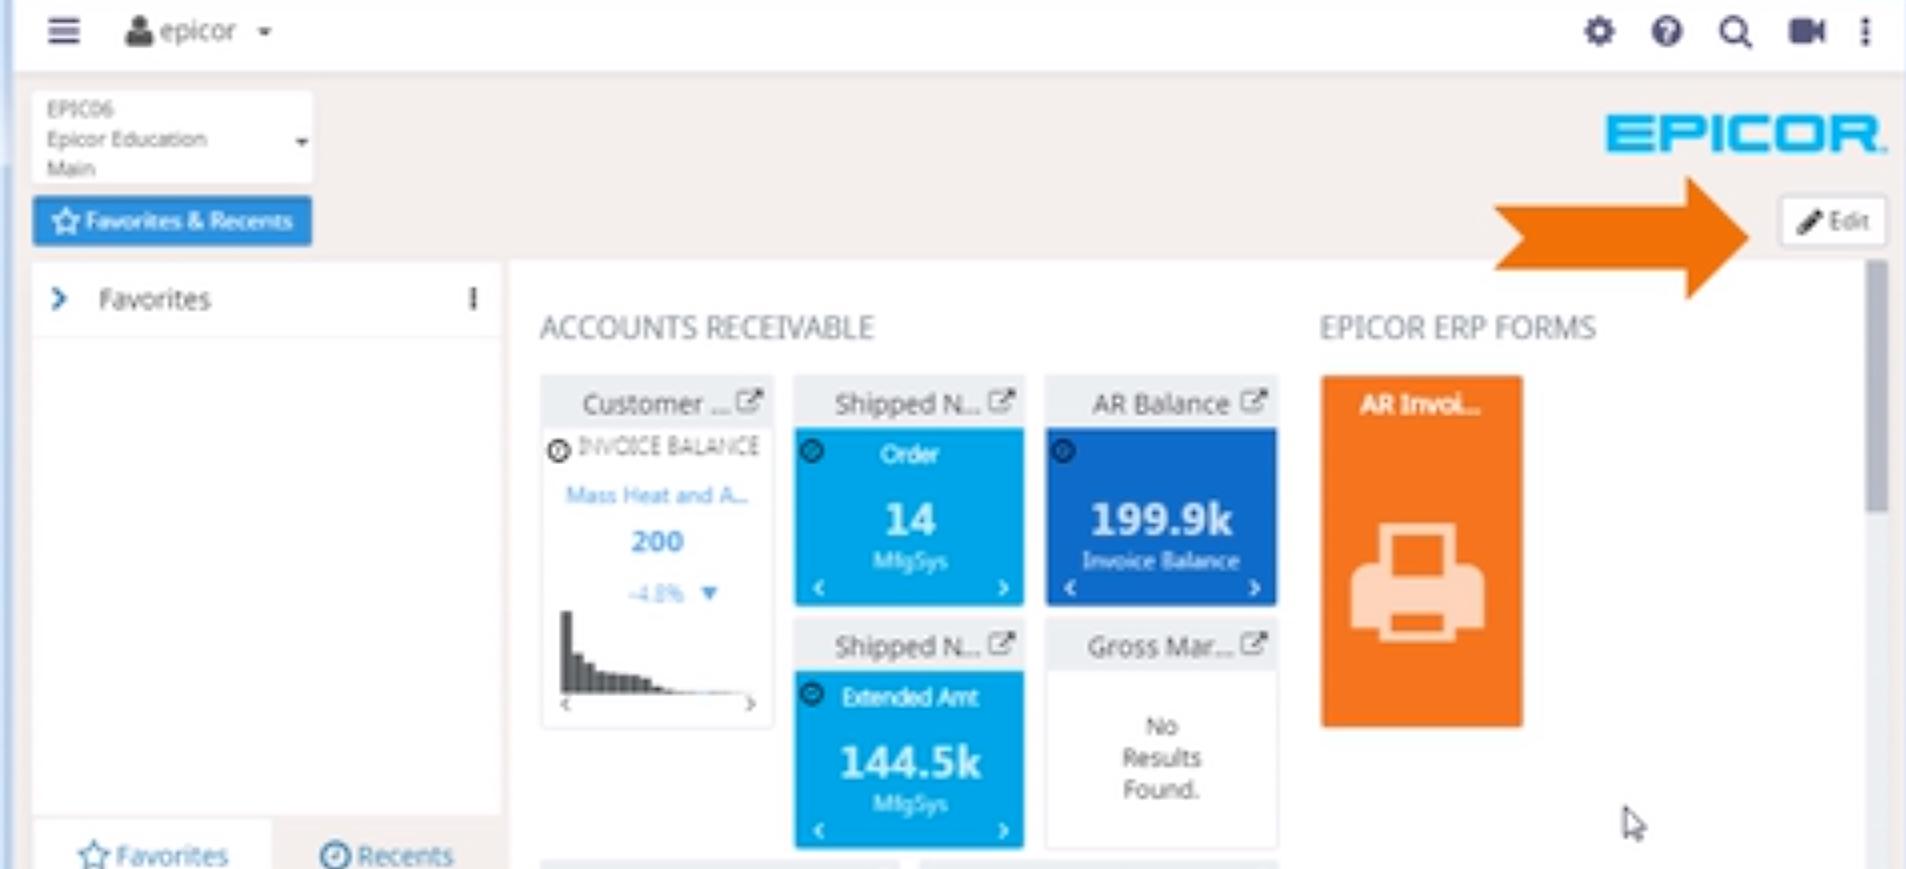 Epicor Home Page